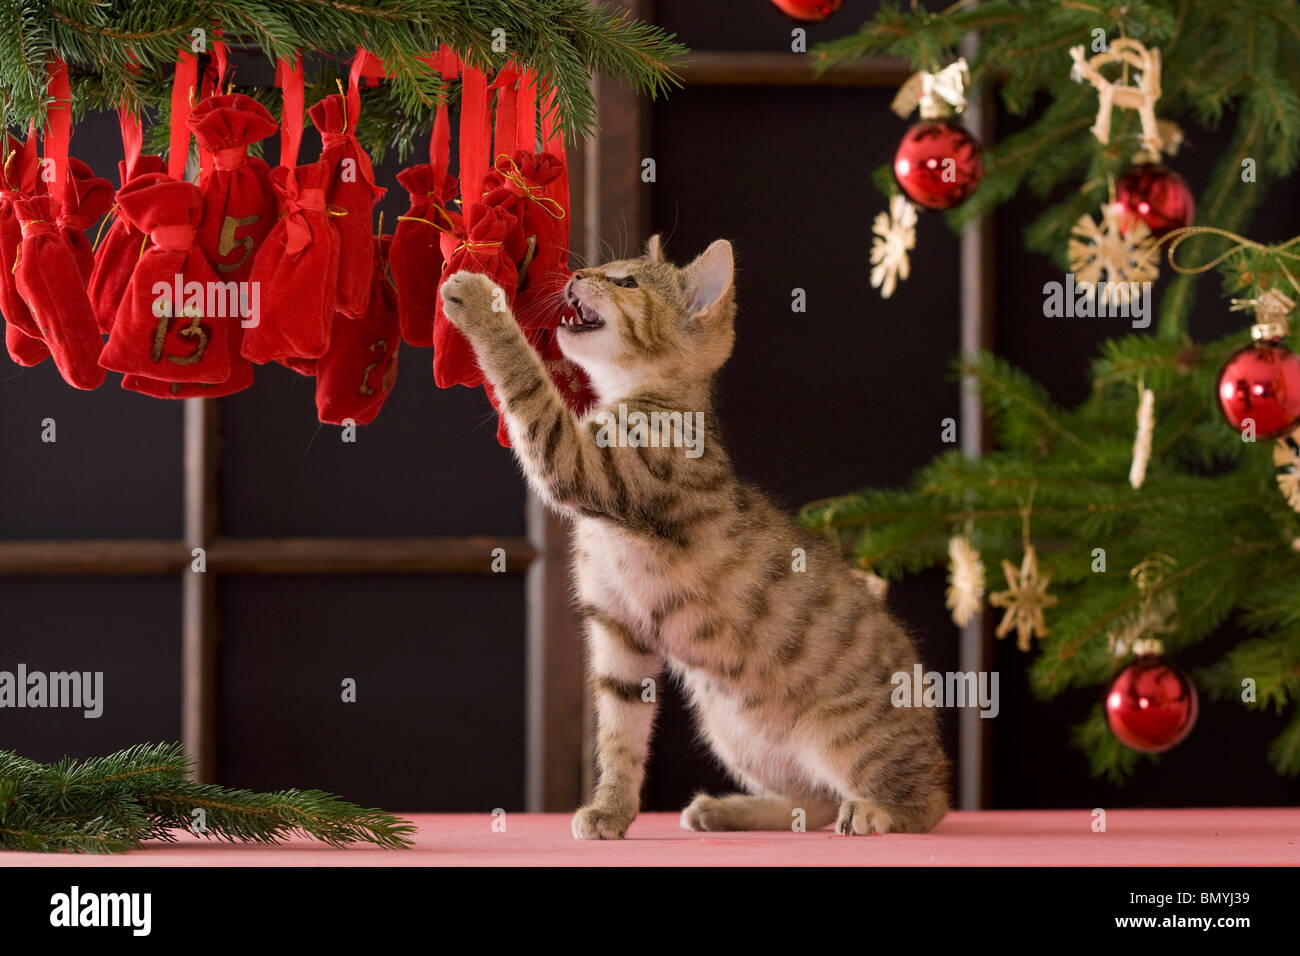 Christmas: domestic cat kitten playing Advent calendar - Stock Image